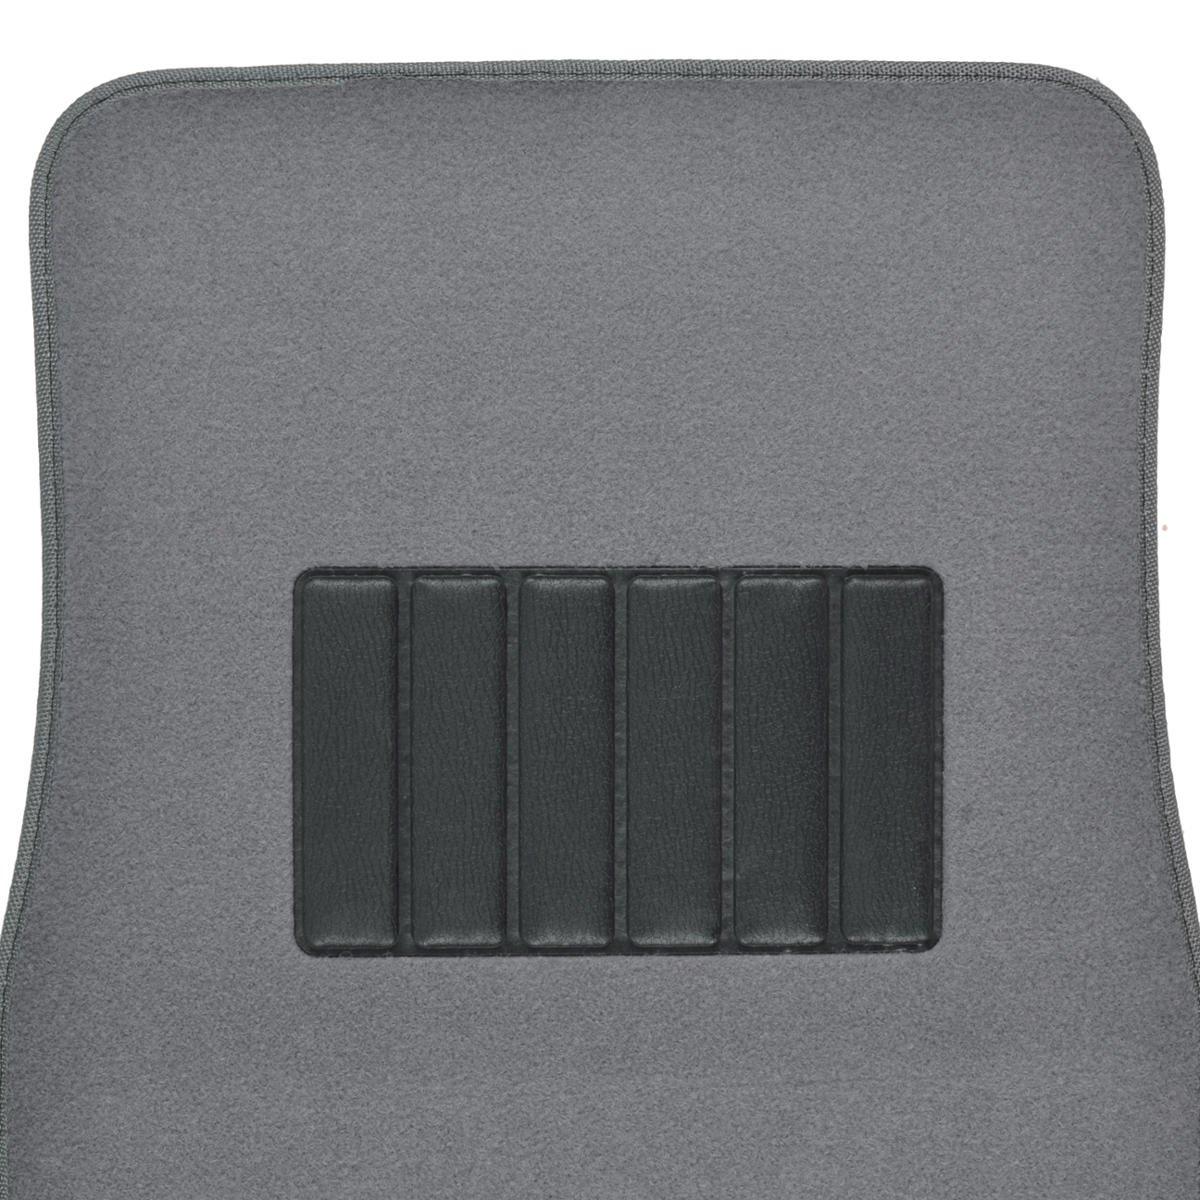 BDK Classic Carpet Floor Mats for Car /& Auto Universal Fit -Front /& Rear with  Heelpad - MT100CC Charcoal